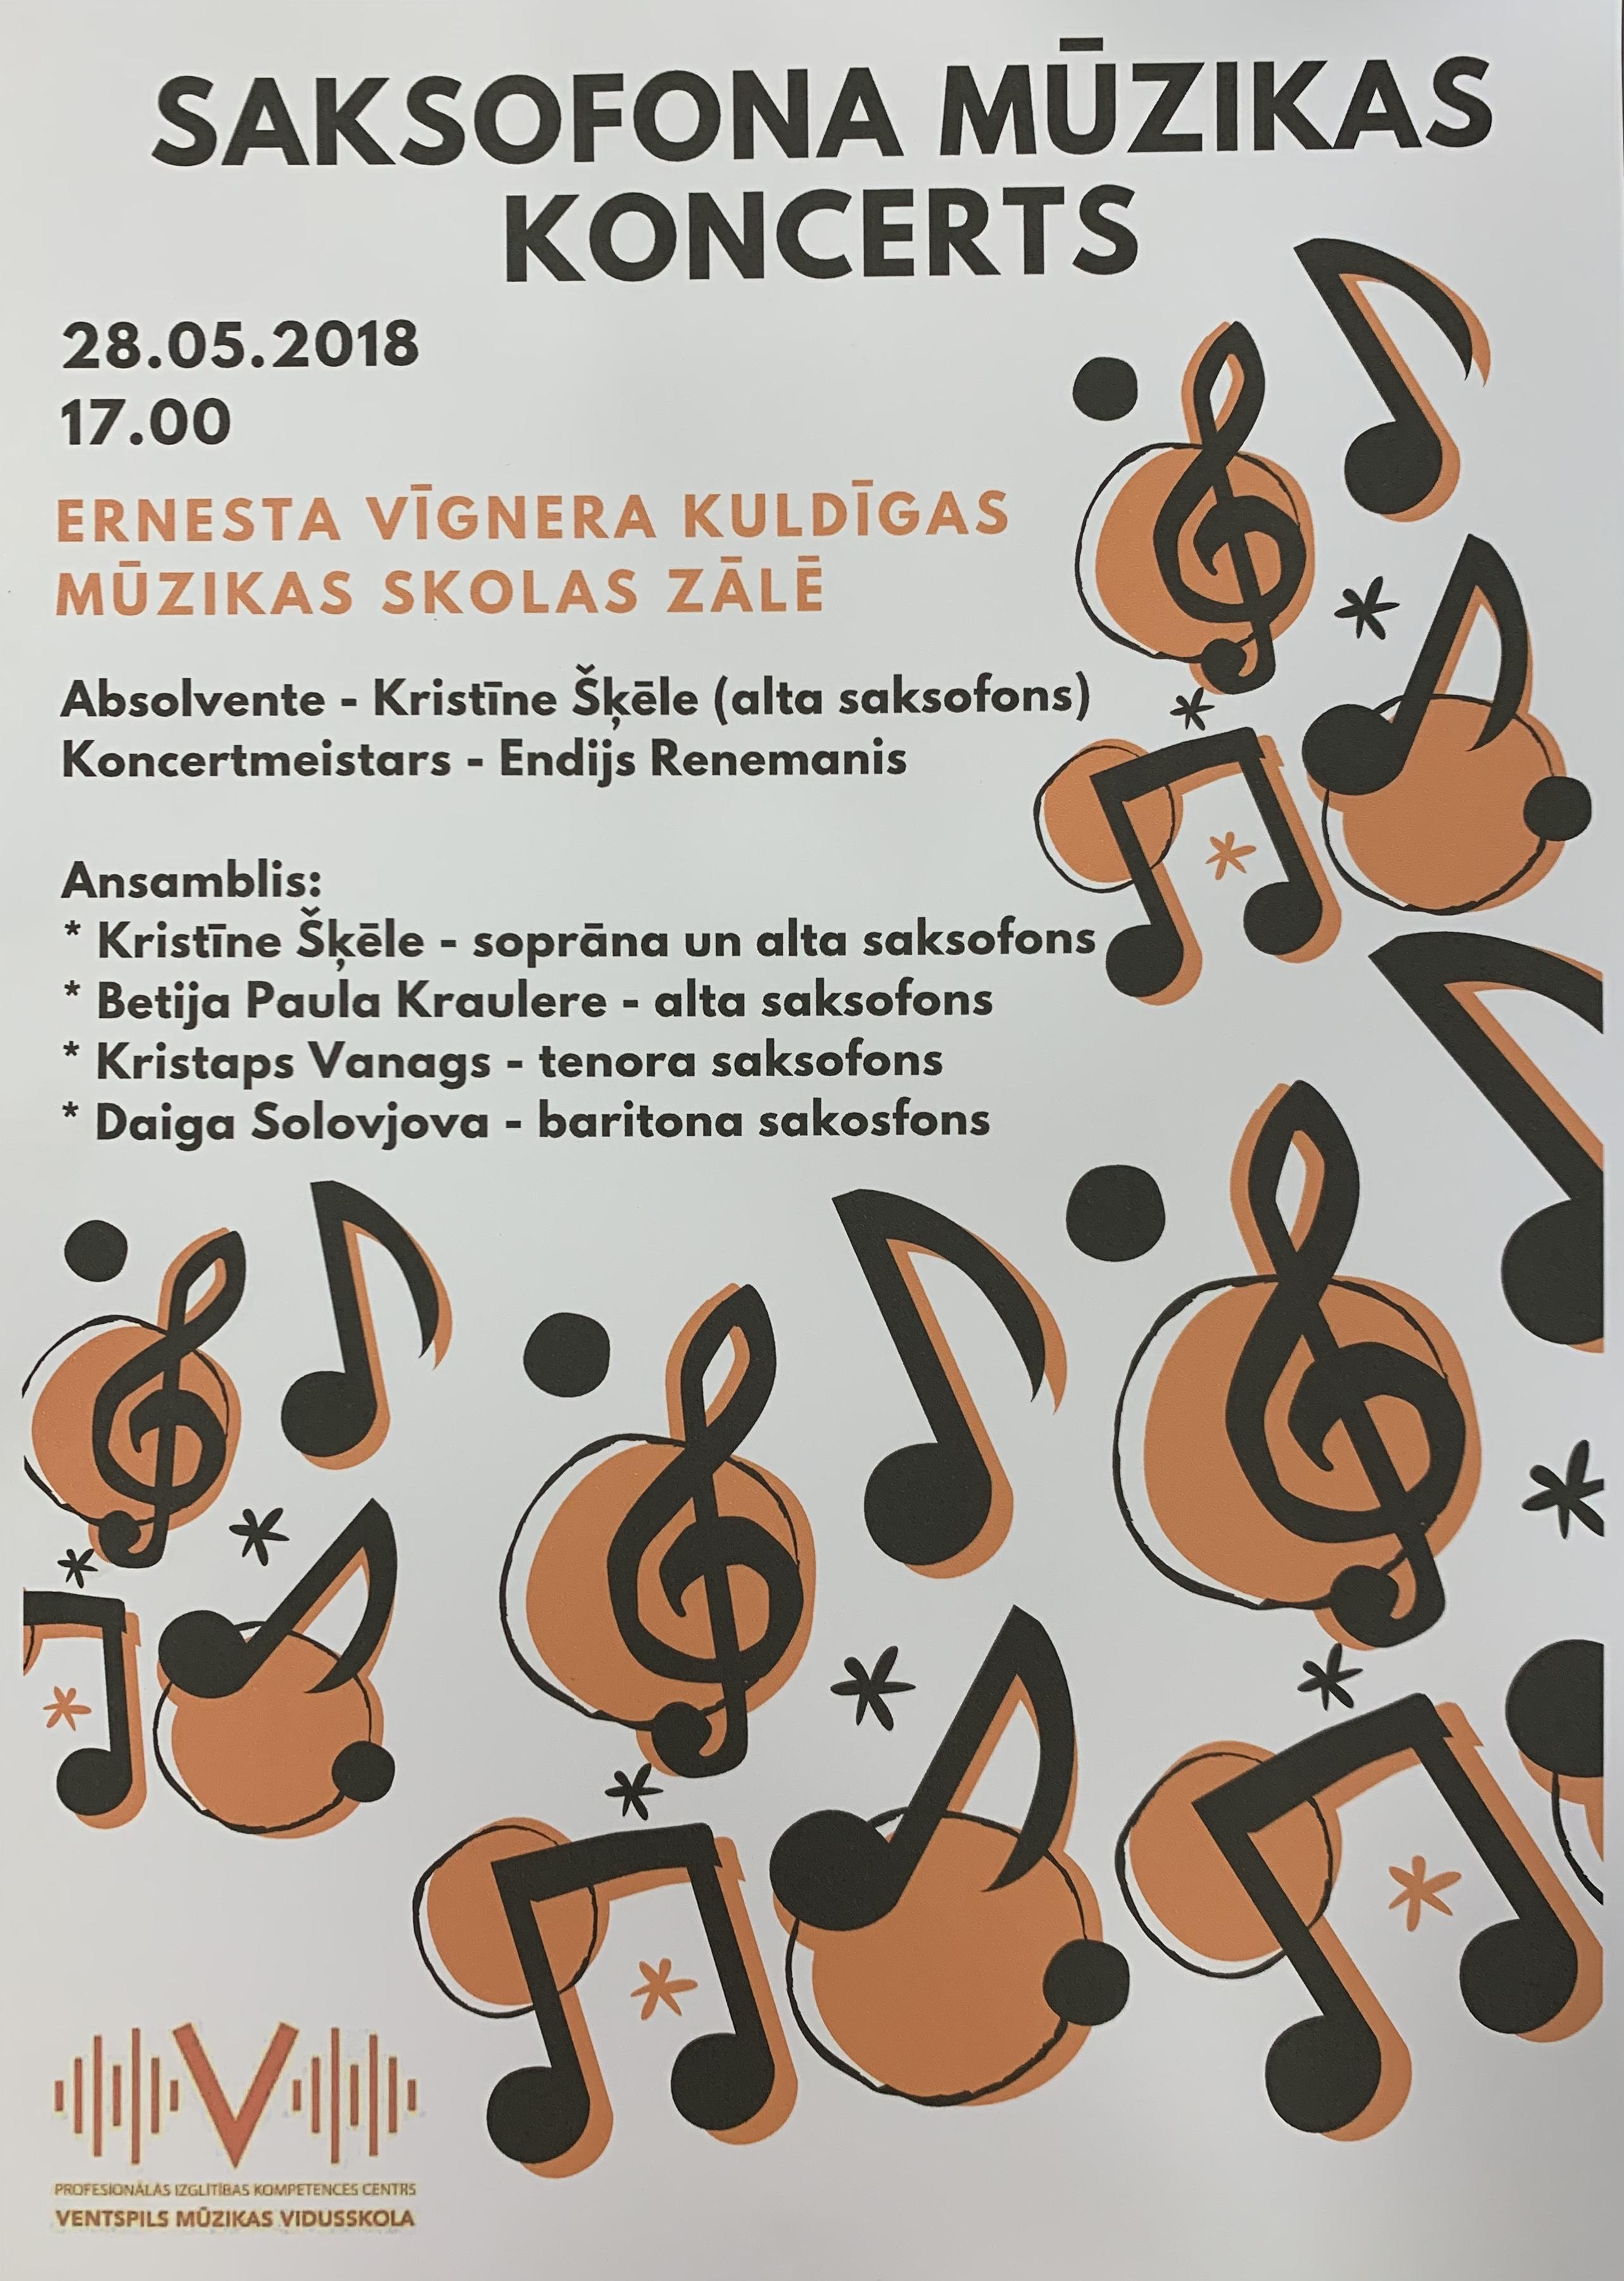 Saksofona mūzikas koncerts